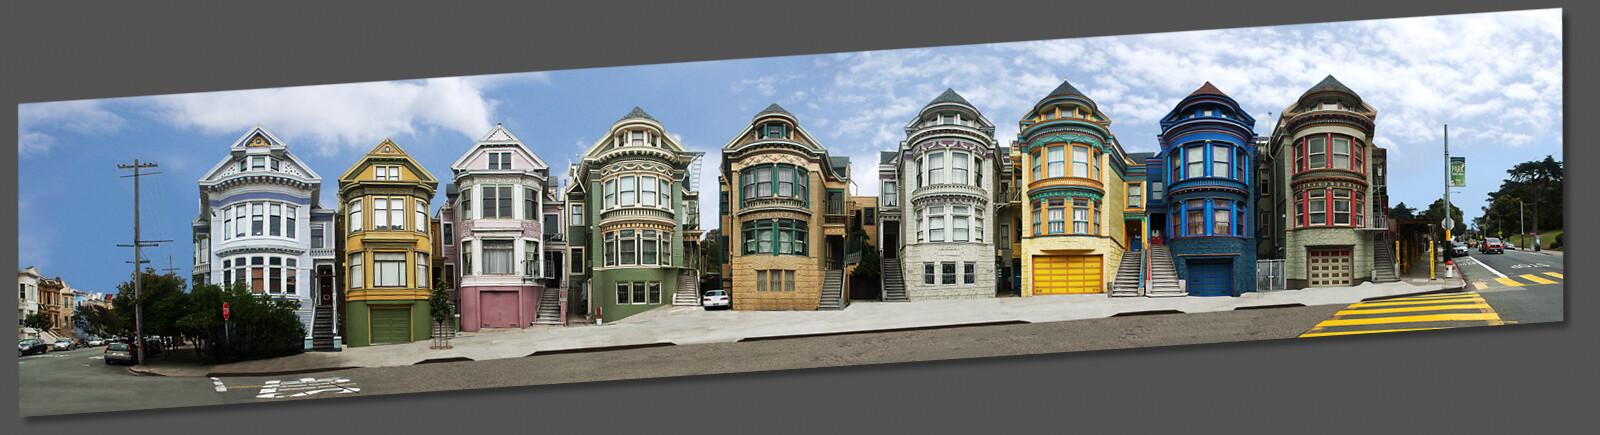 San Francisco, Central Avenue  - Larry Yust